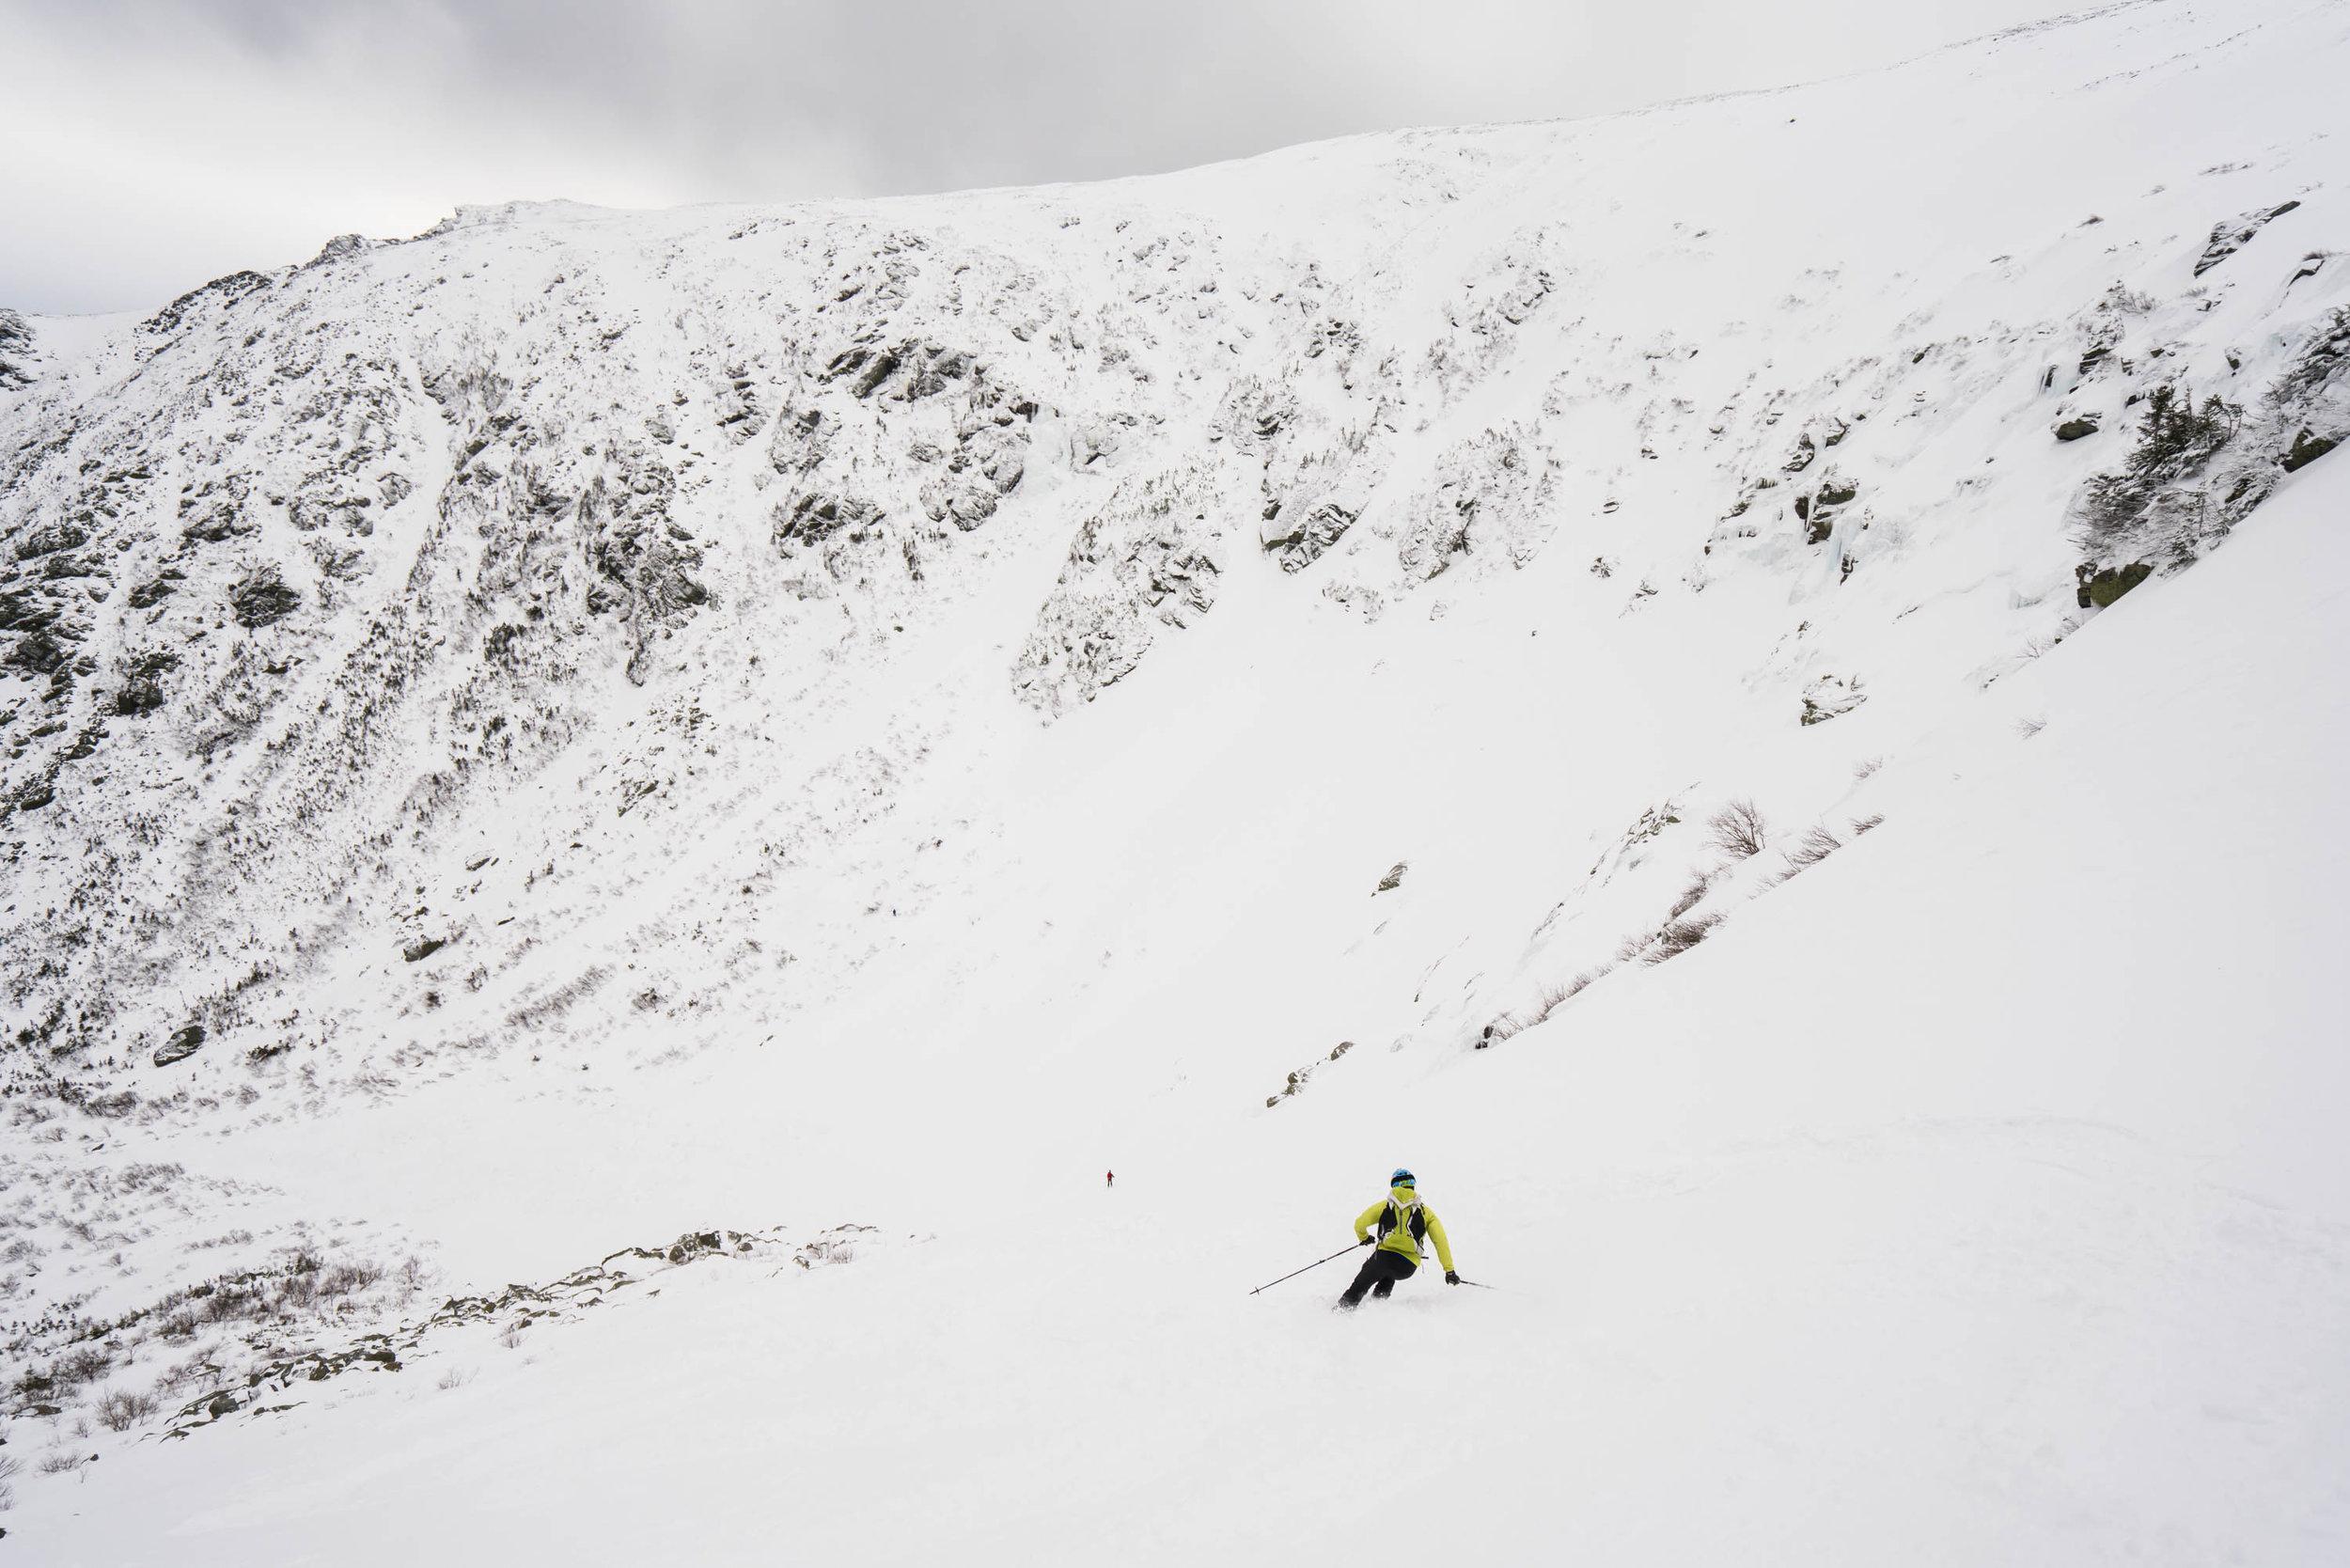 Alex skiing just next to Right Gully, Tuckerman Ravine